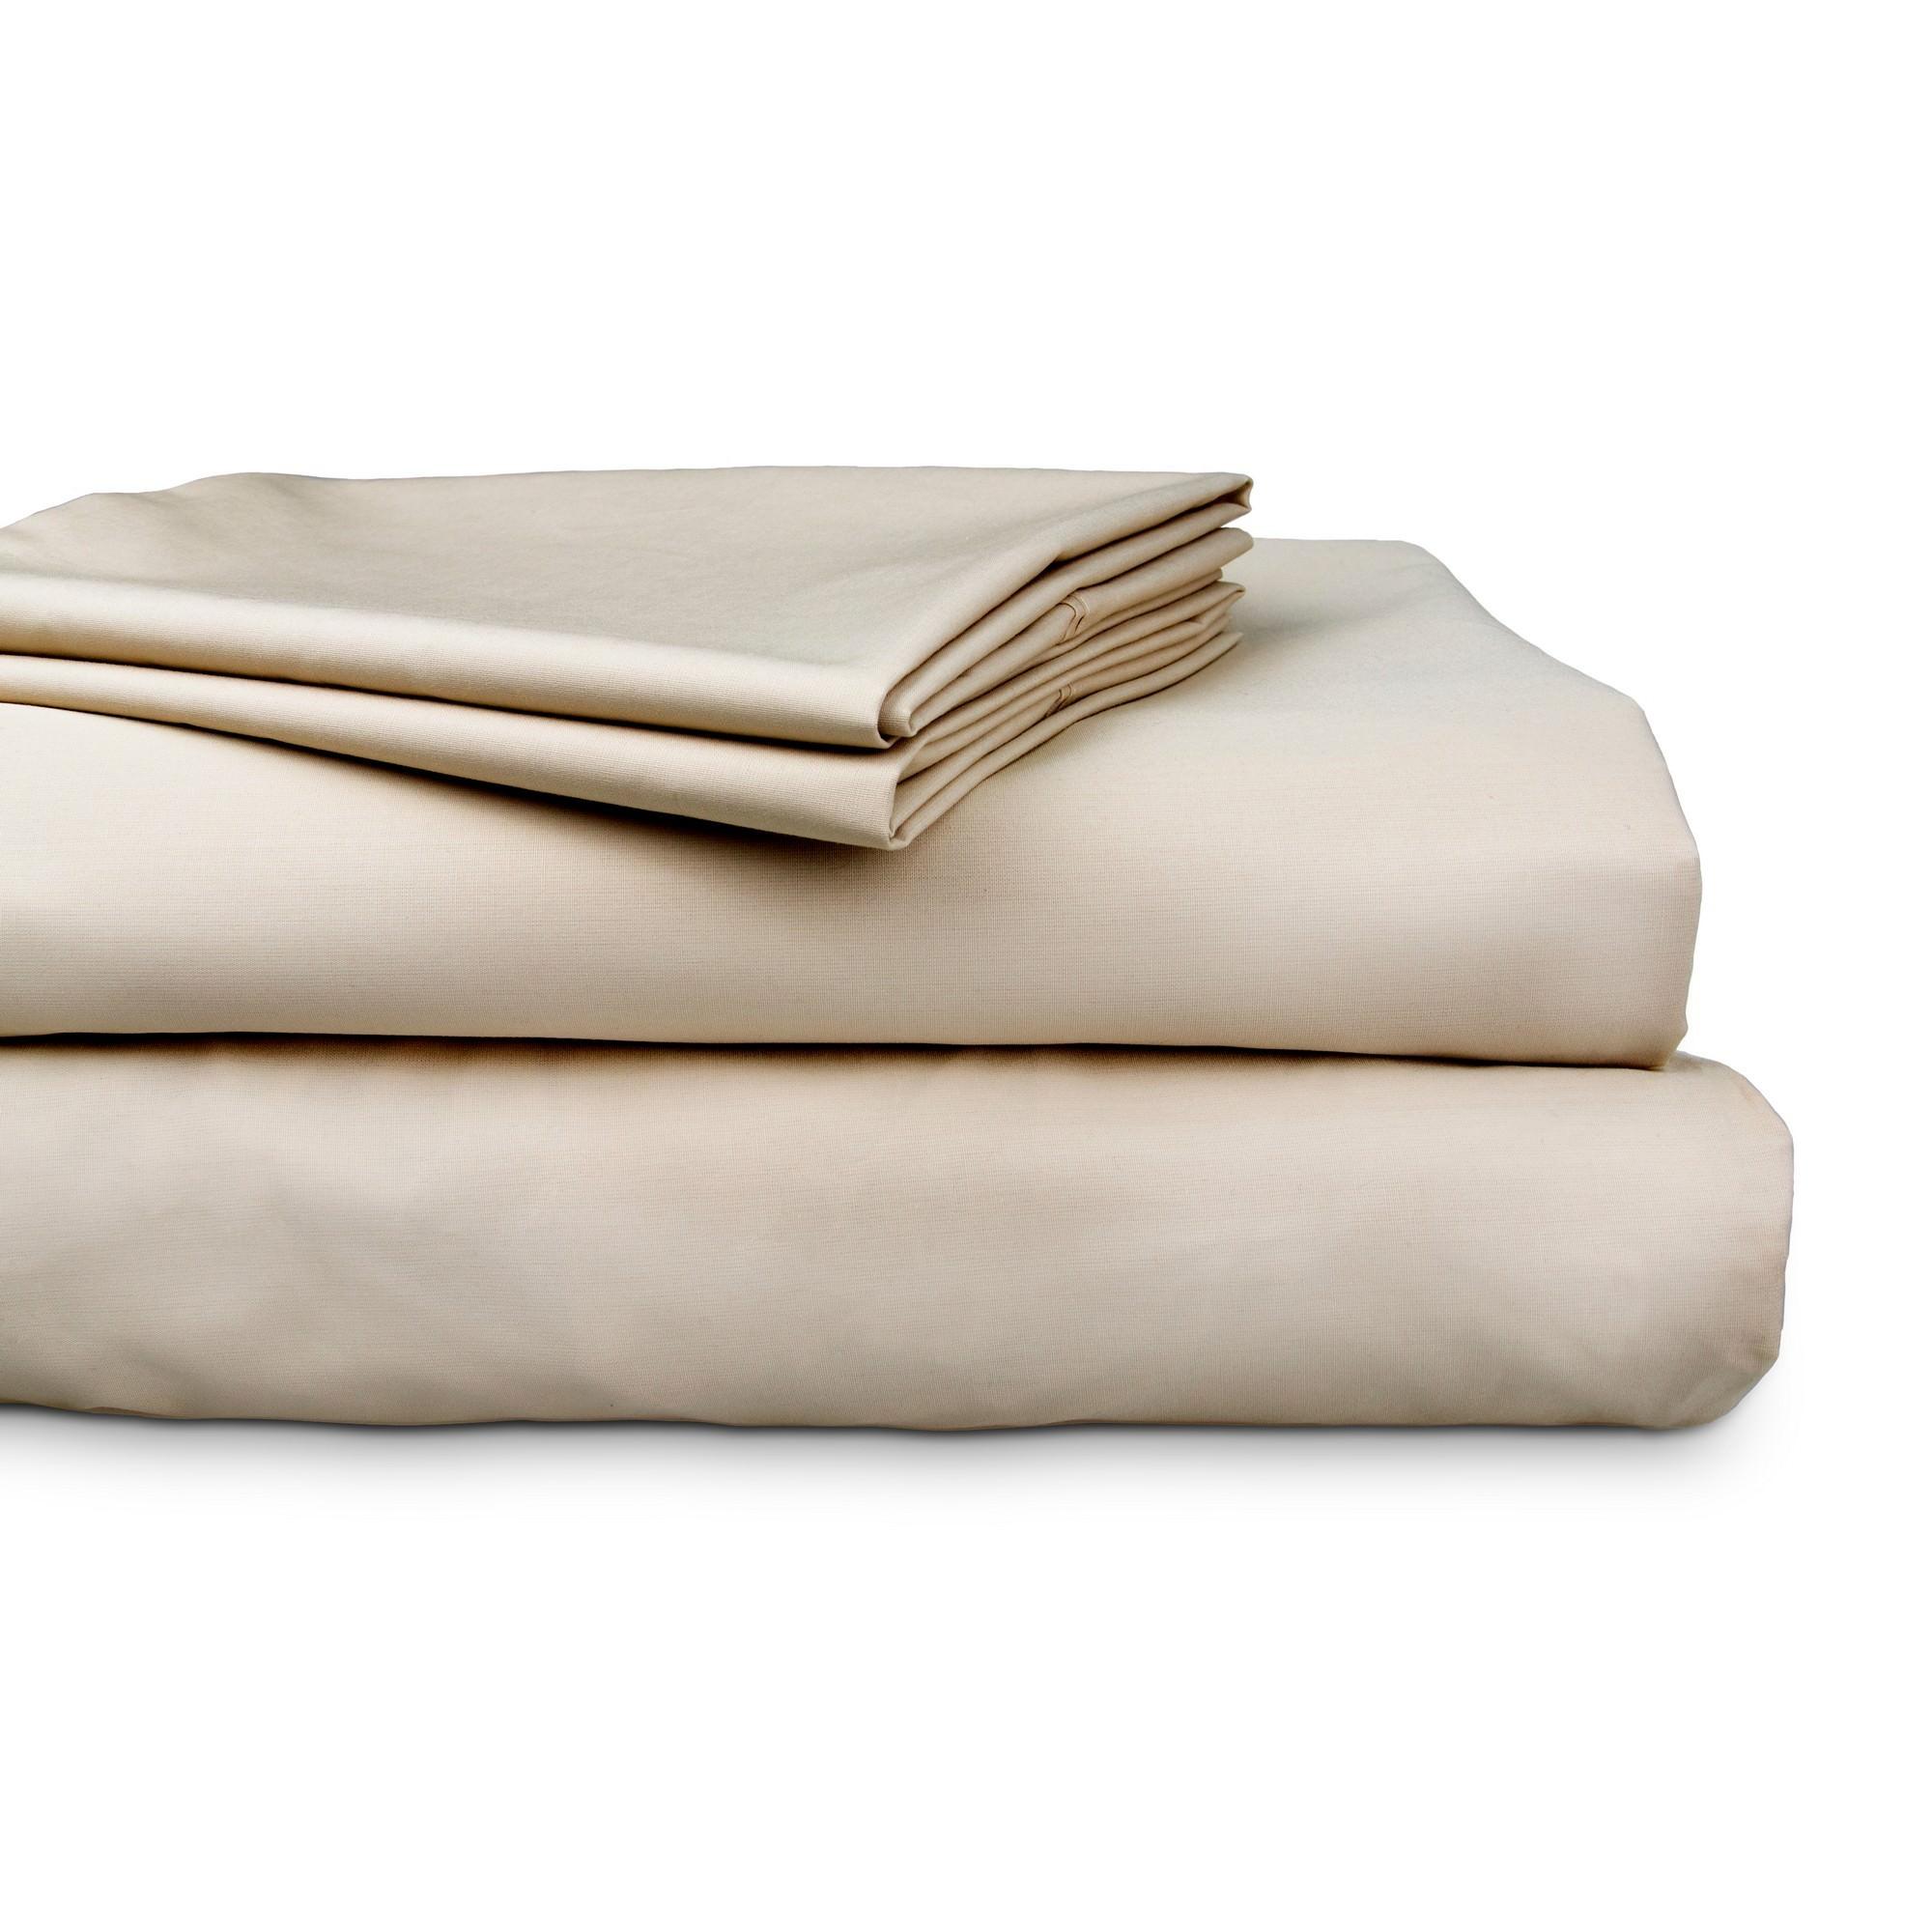 Ajee 4 Piece 300TC Cotton Sheet Set, Double, Stone